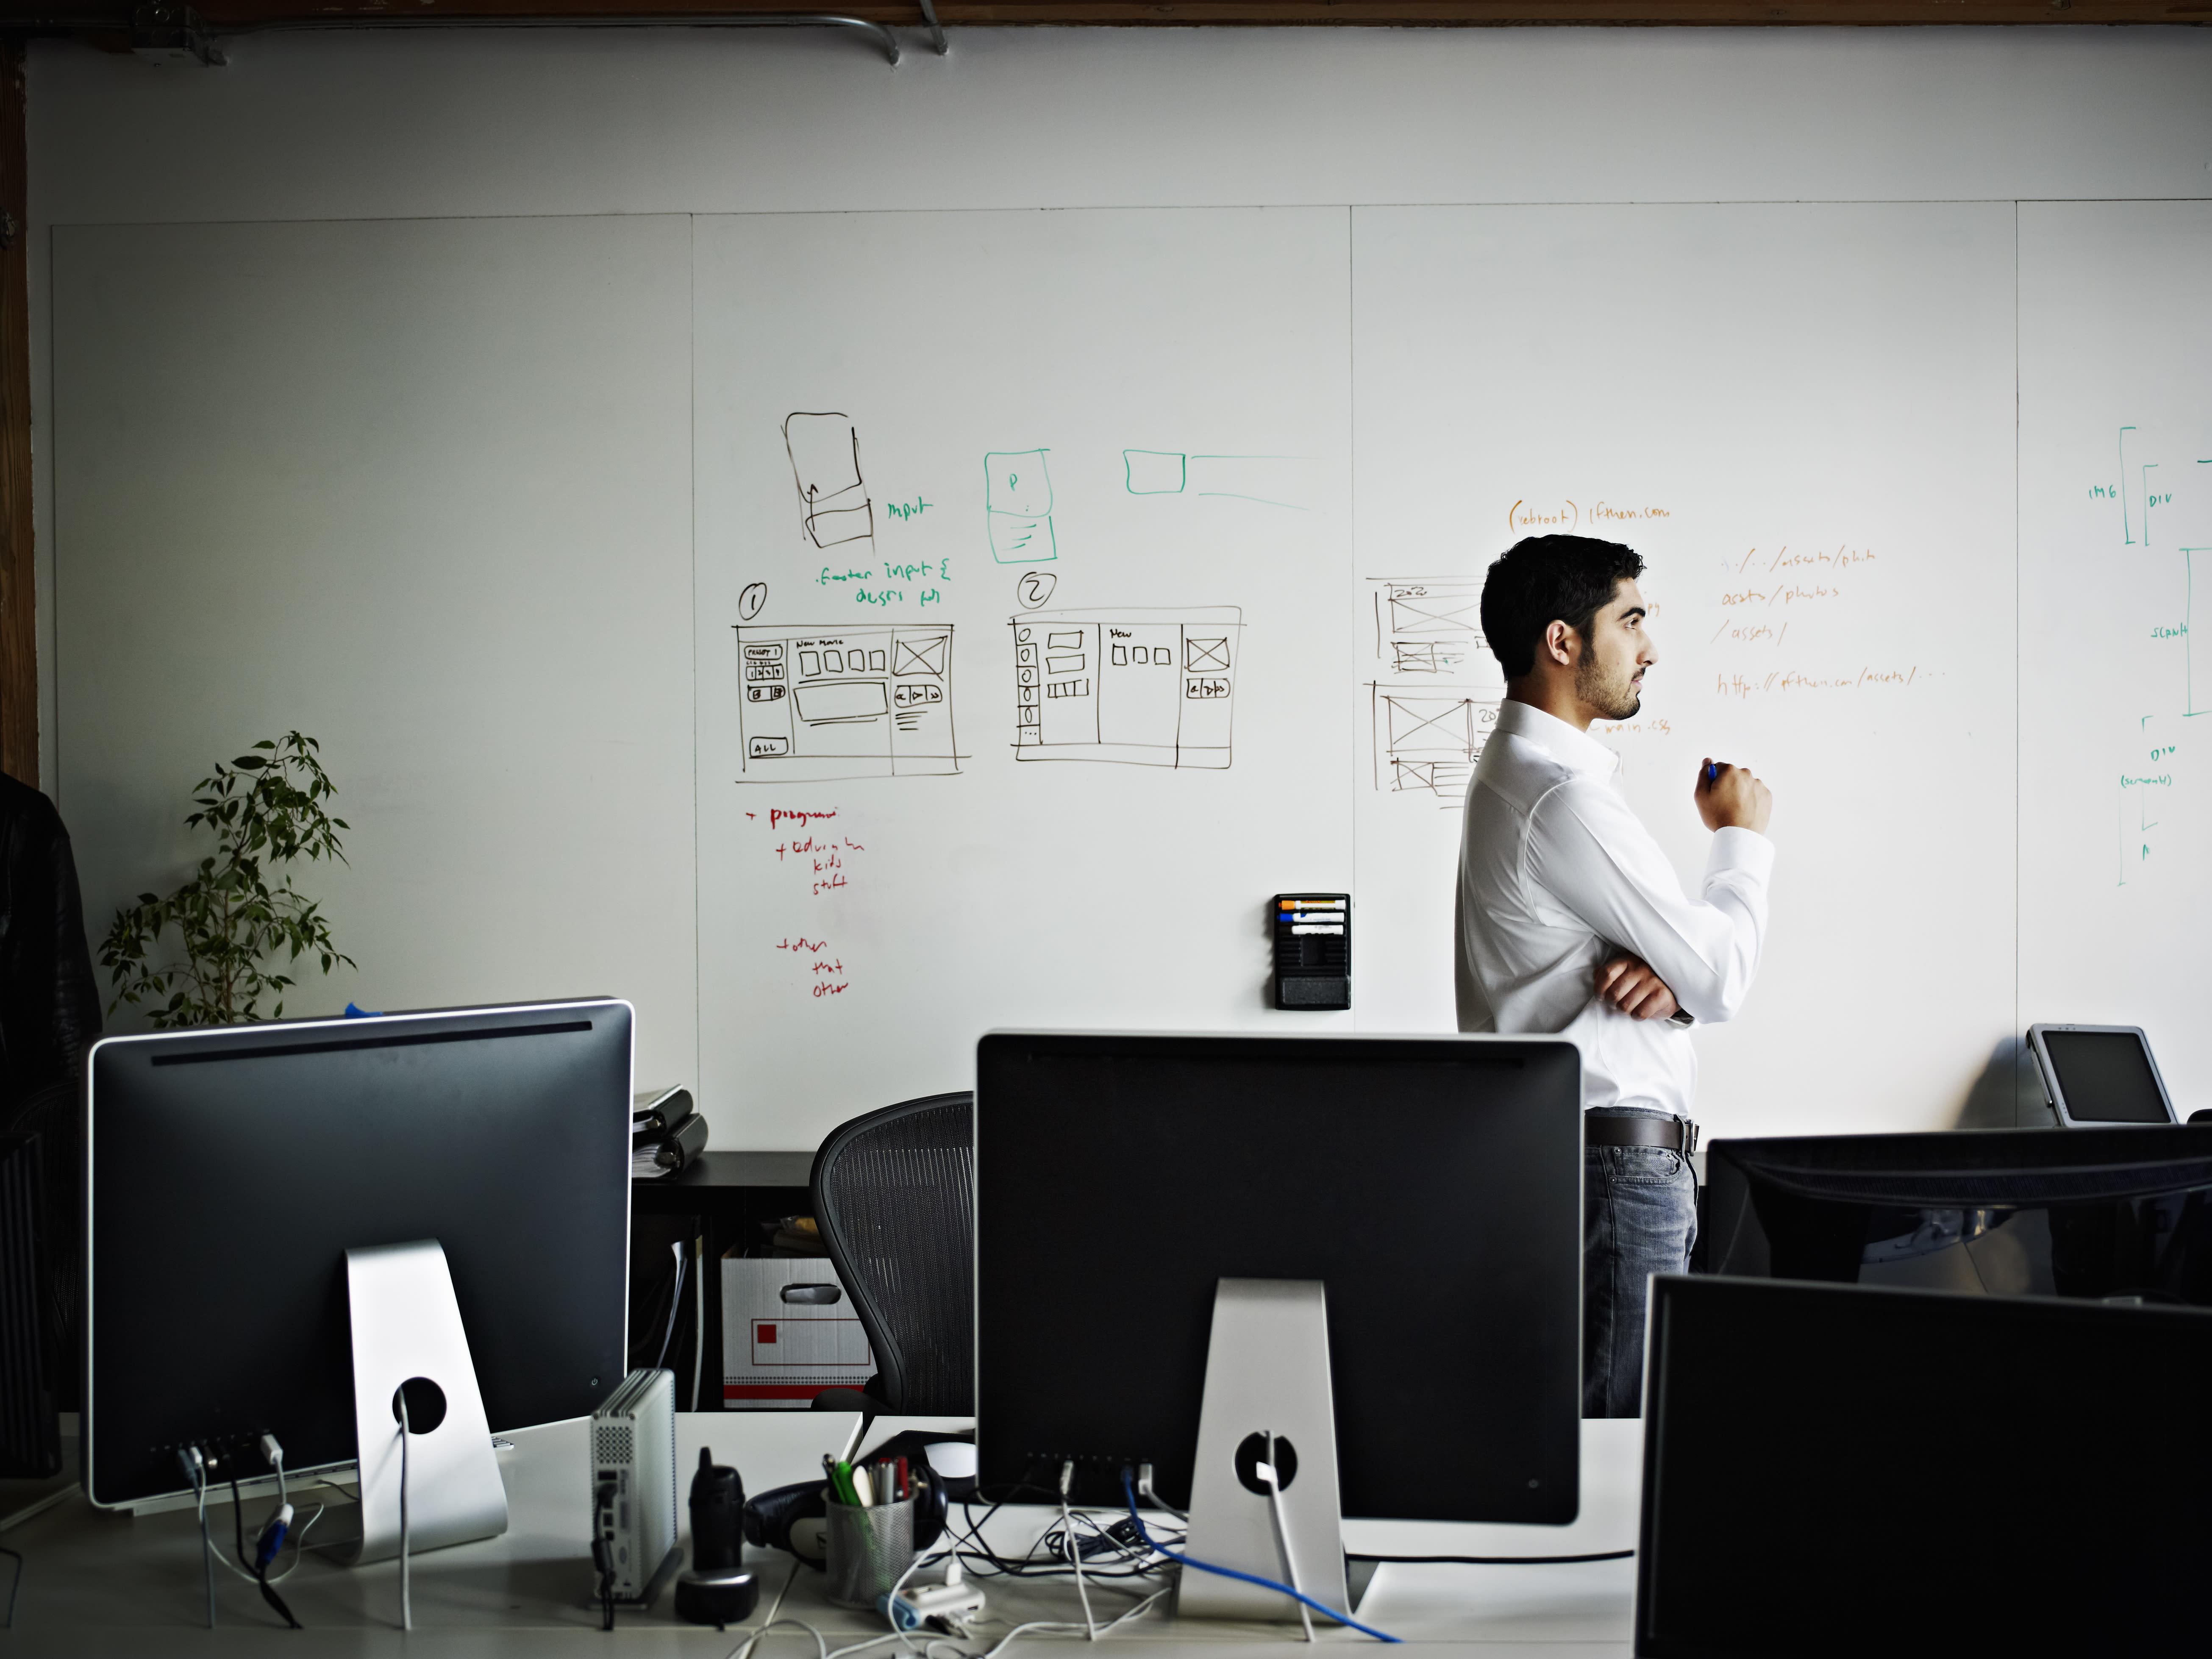 A Five-Time Entrepreneur Explains Whether You Should Raise Money or Bootstrap